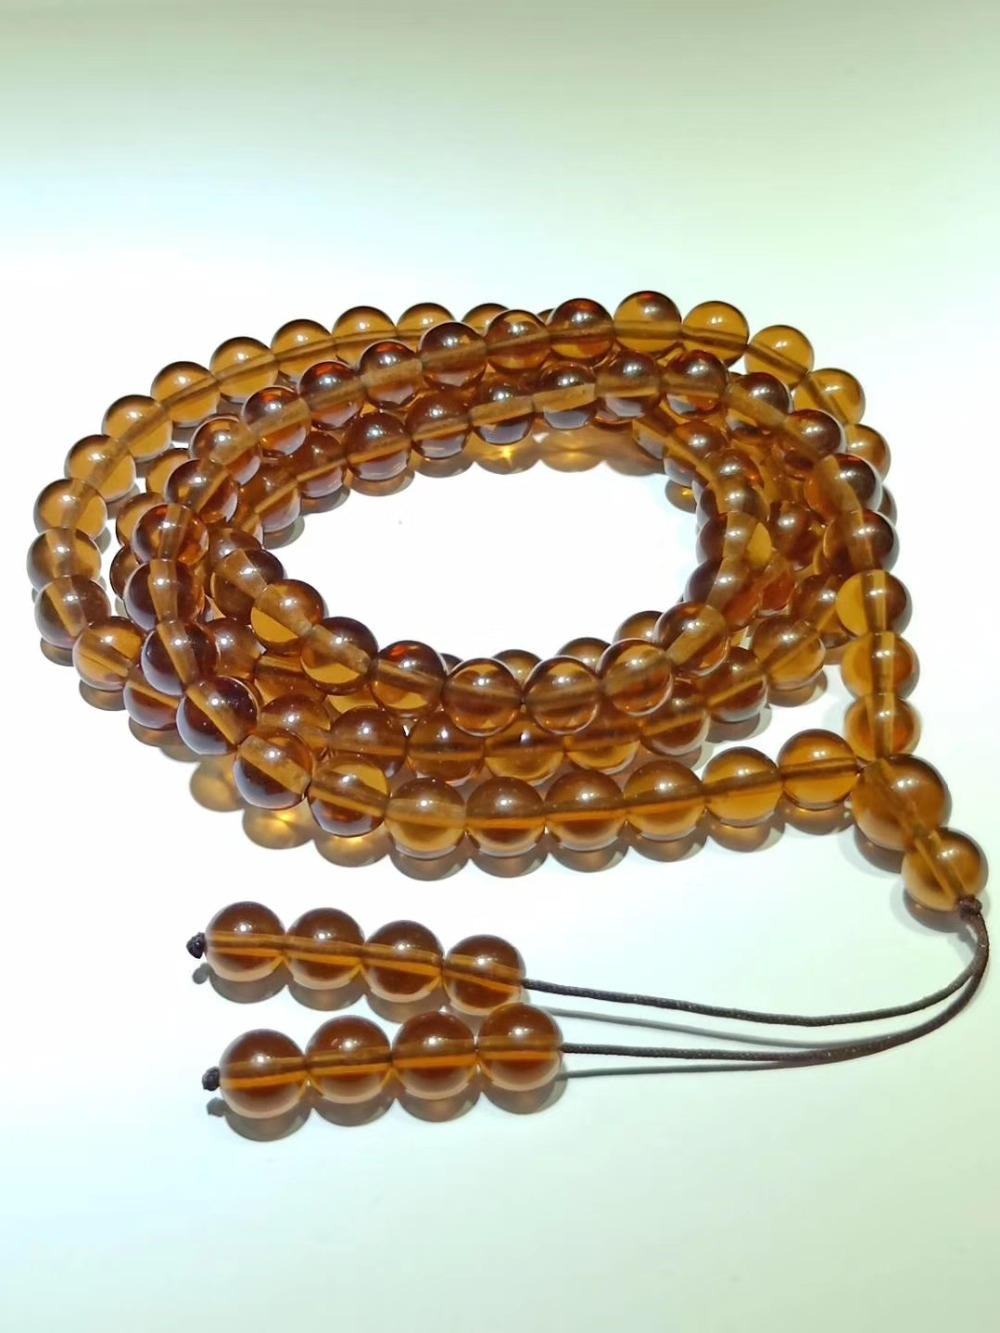 8mm Arizona Sirius meteorite impact glass 108 bead bracelet in Stones from Home Garden